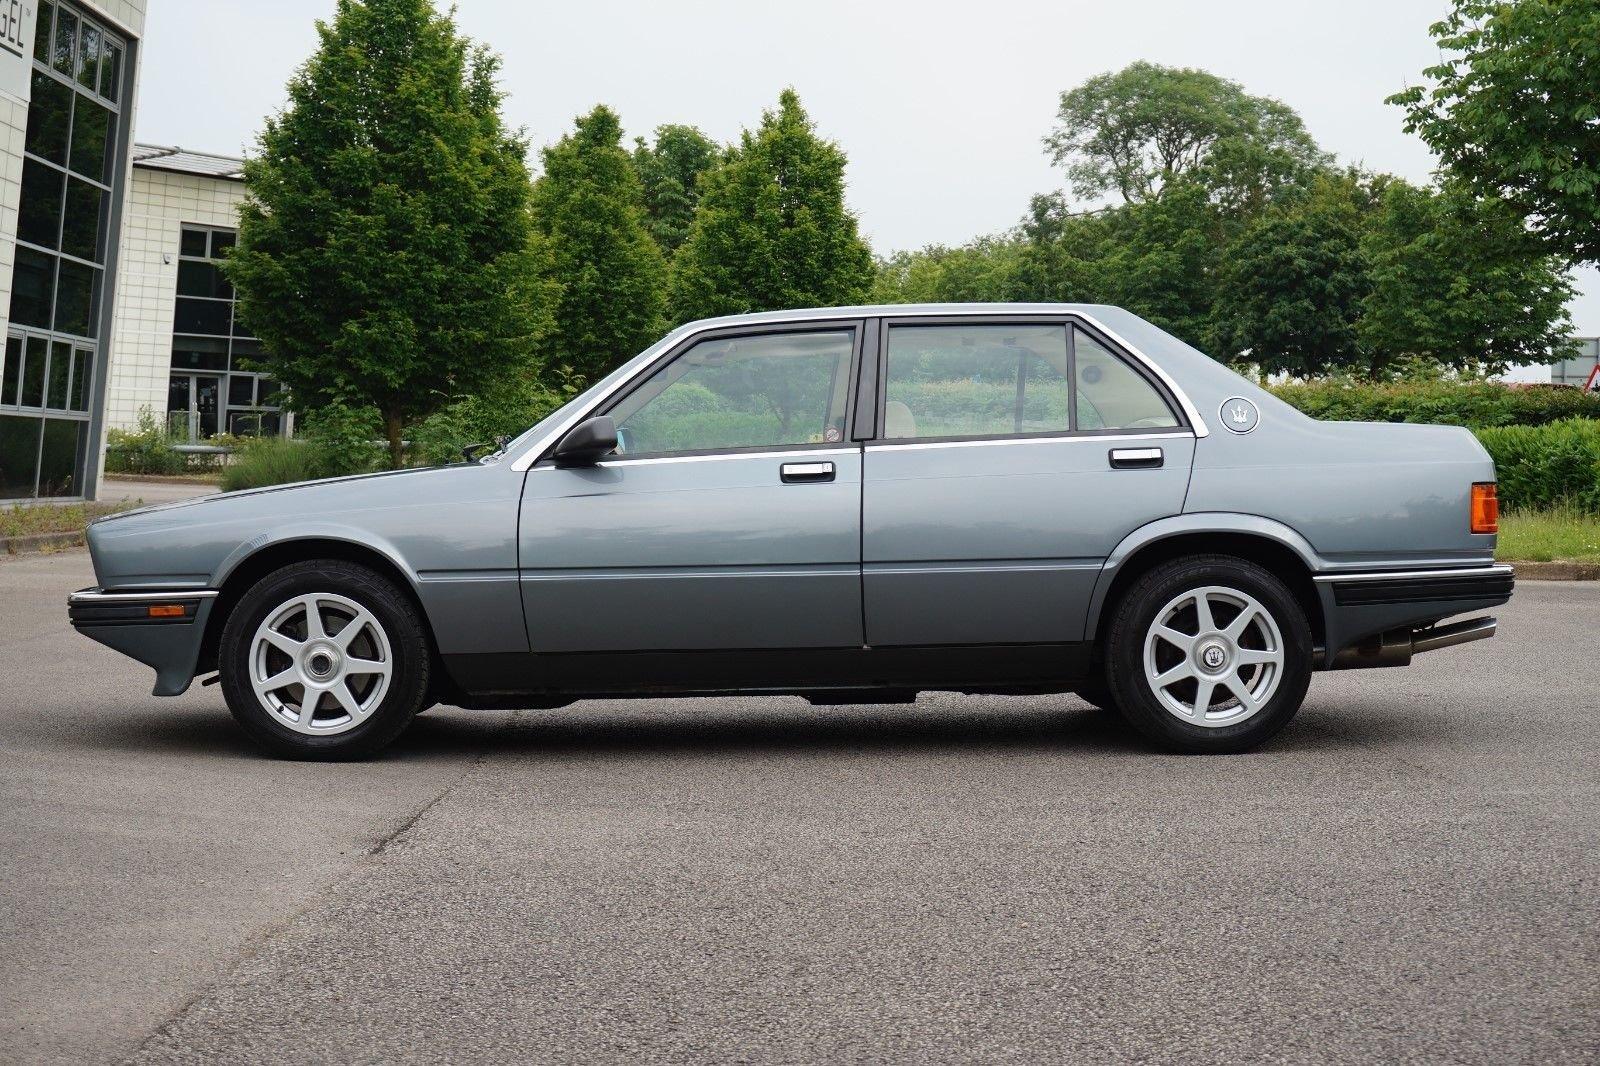 1989 Maserati biturbo 430 25300 miles RHD new MOT +Belt For Sale (picture 2 of 6)